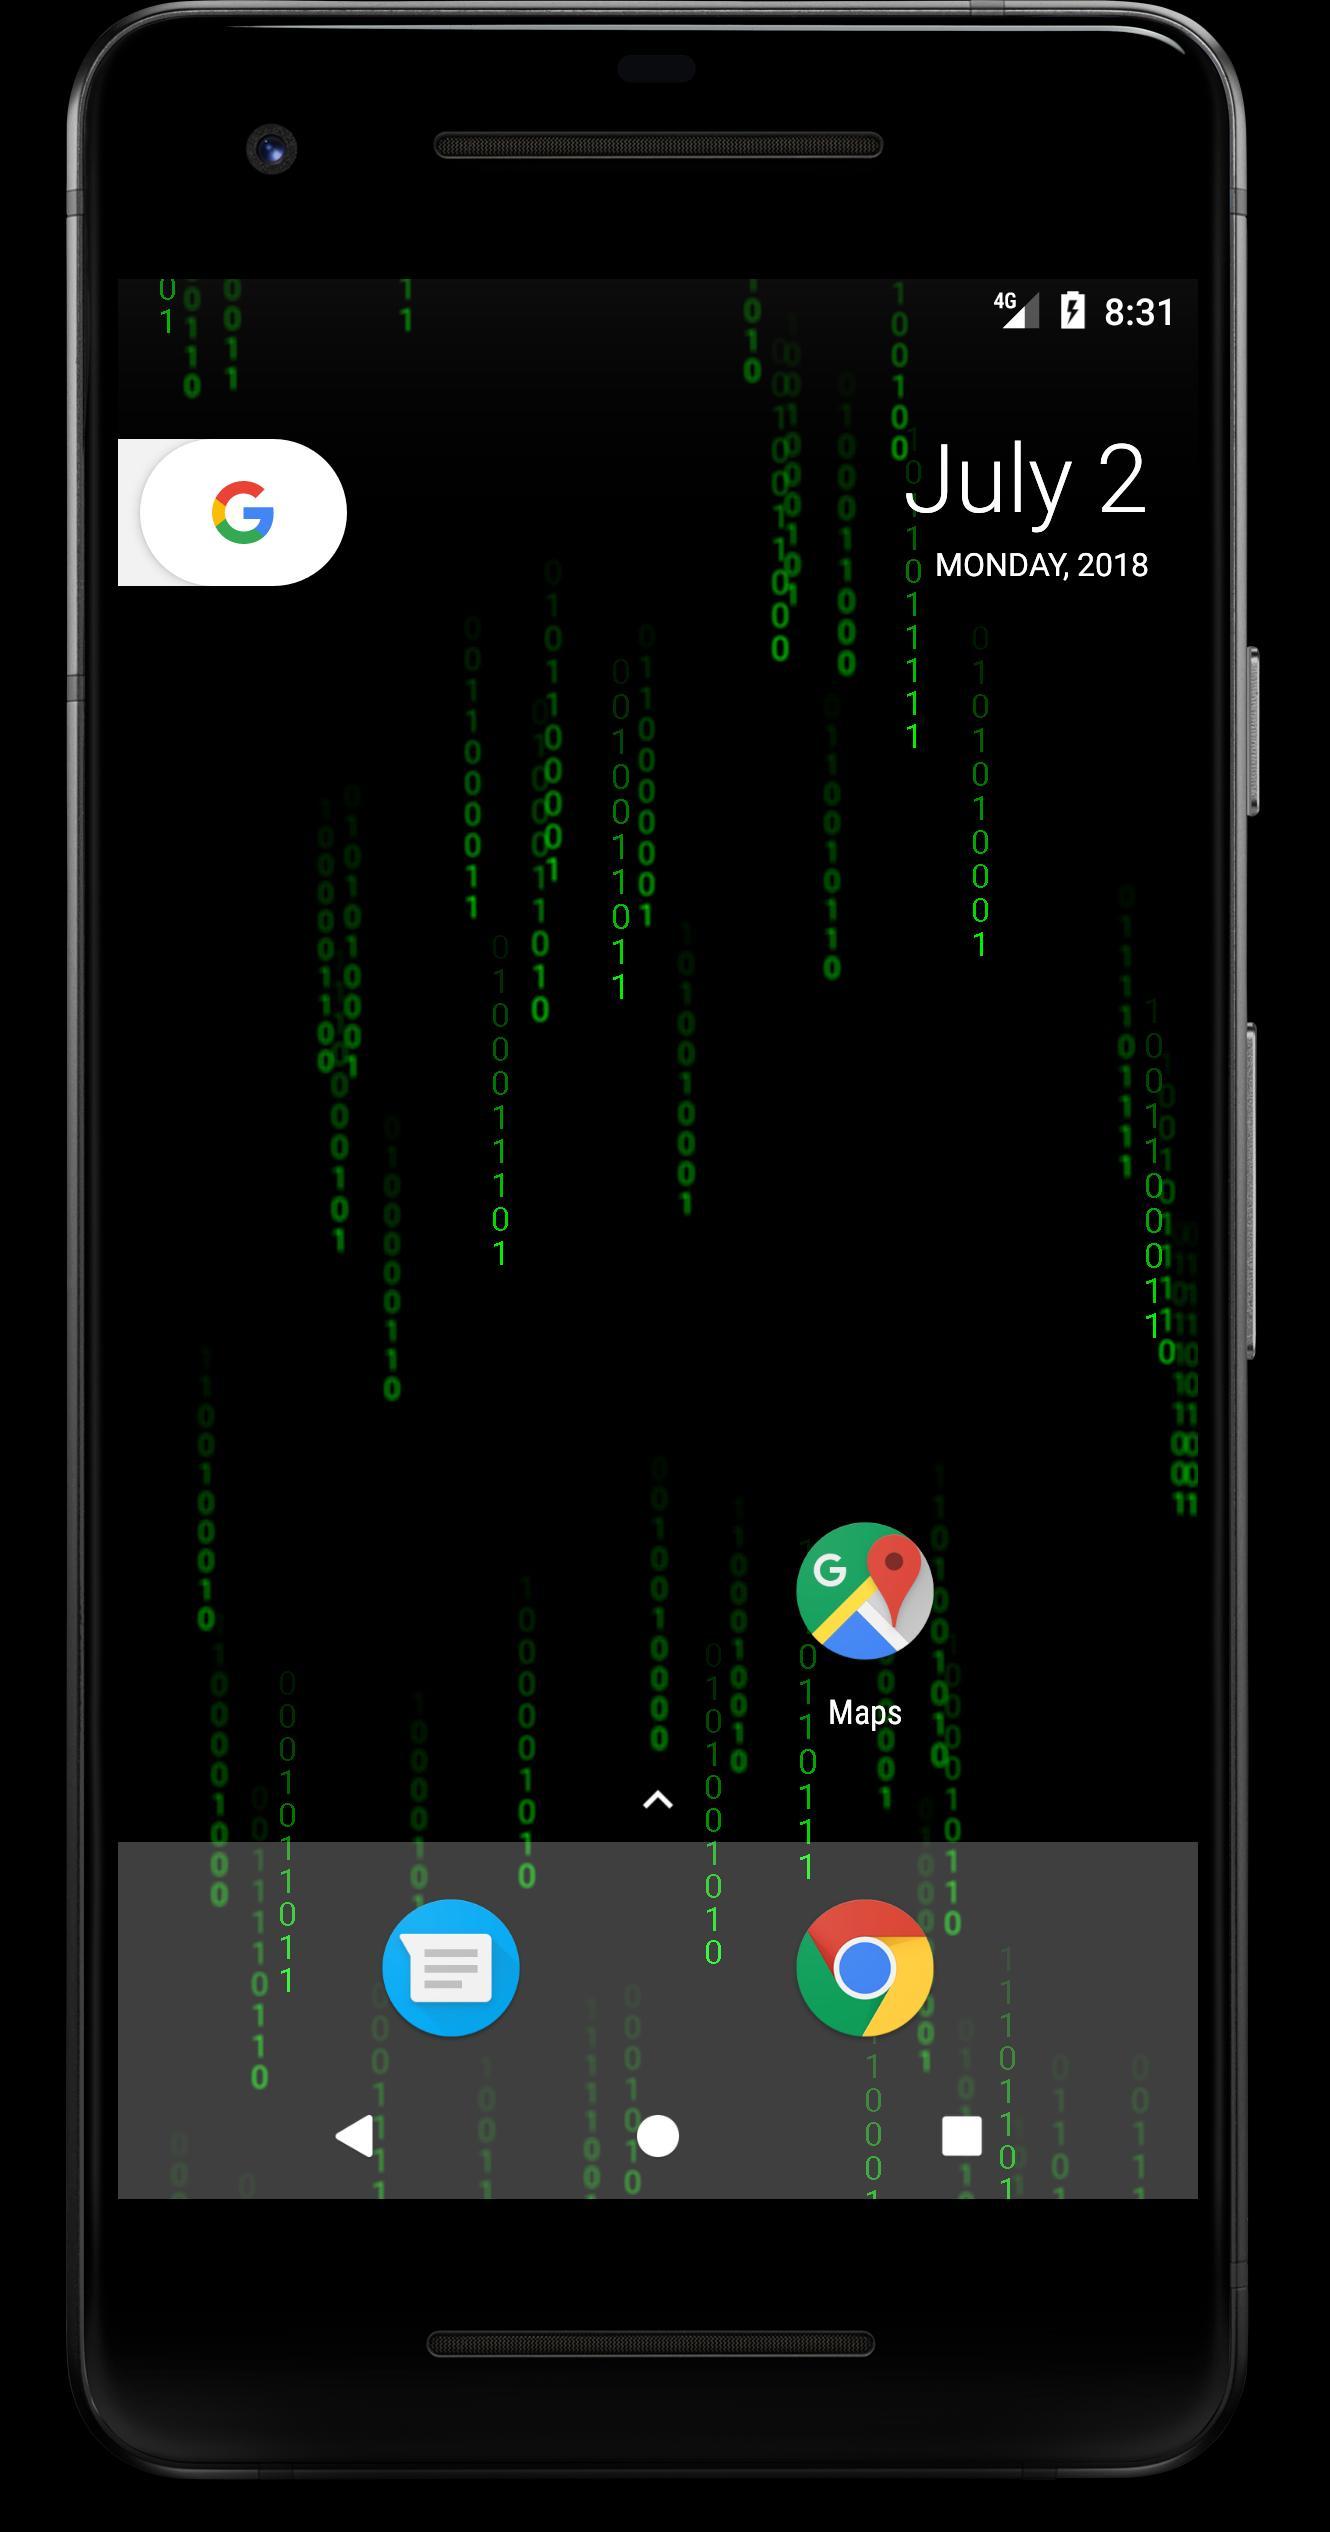 Hacker Matrix Live Wallpaper For Android Apk Download